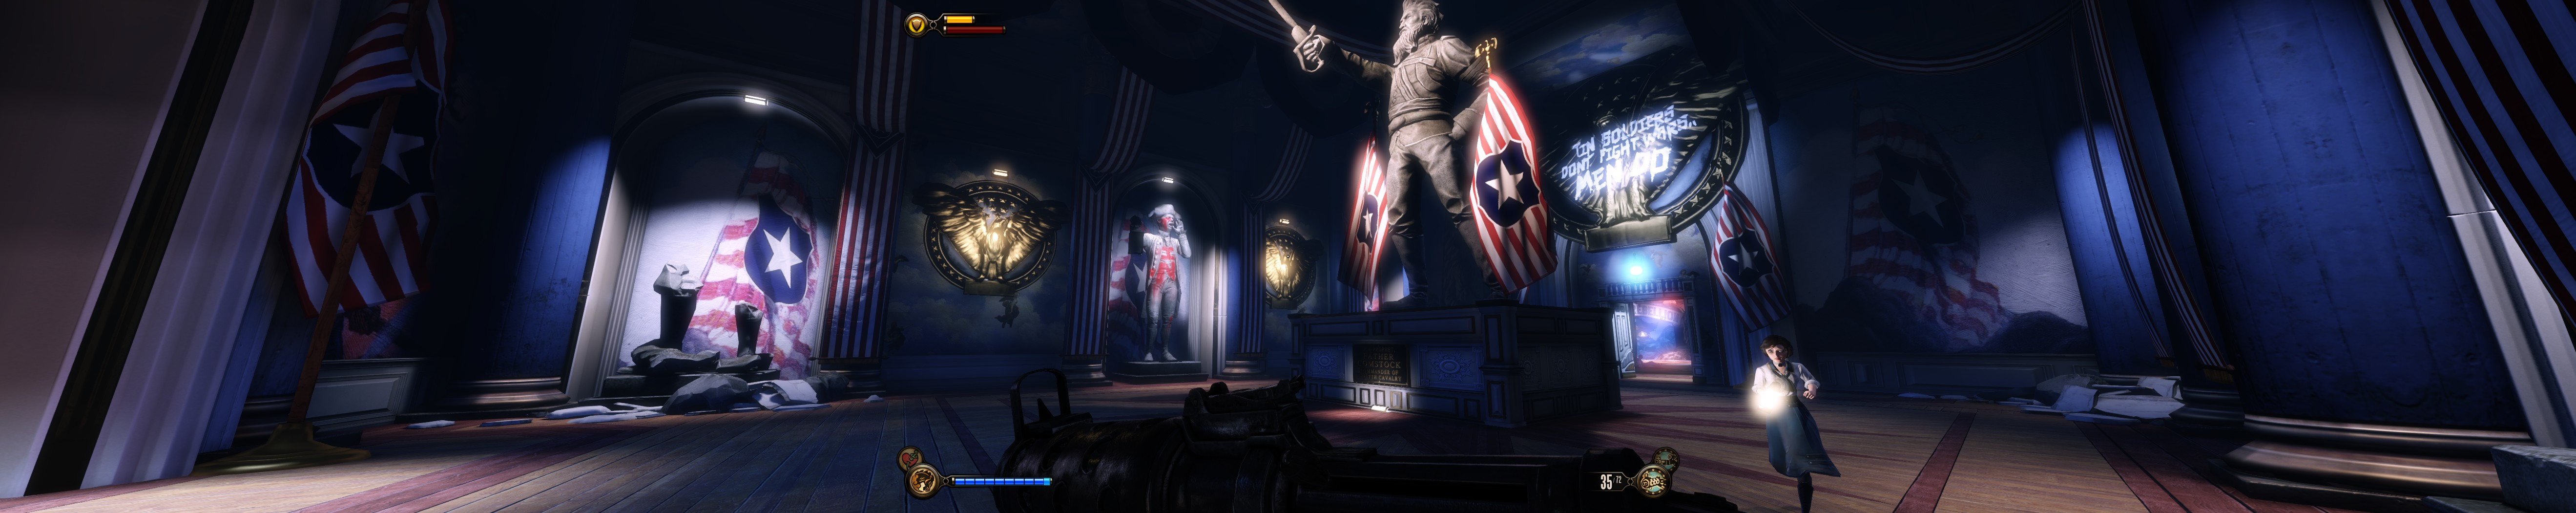 Bioshock_Infinite_2013-04-21_00047.jpg